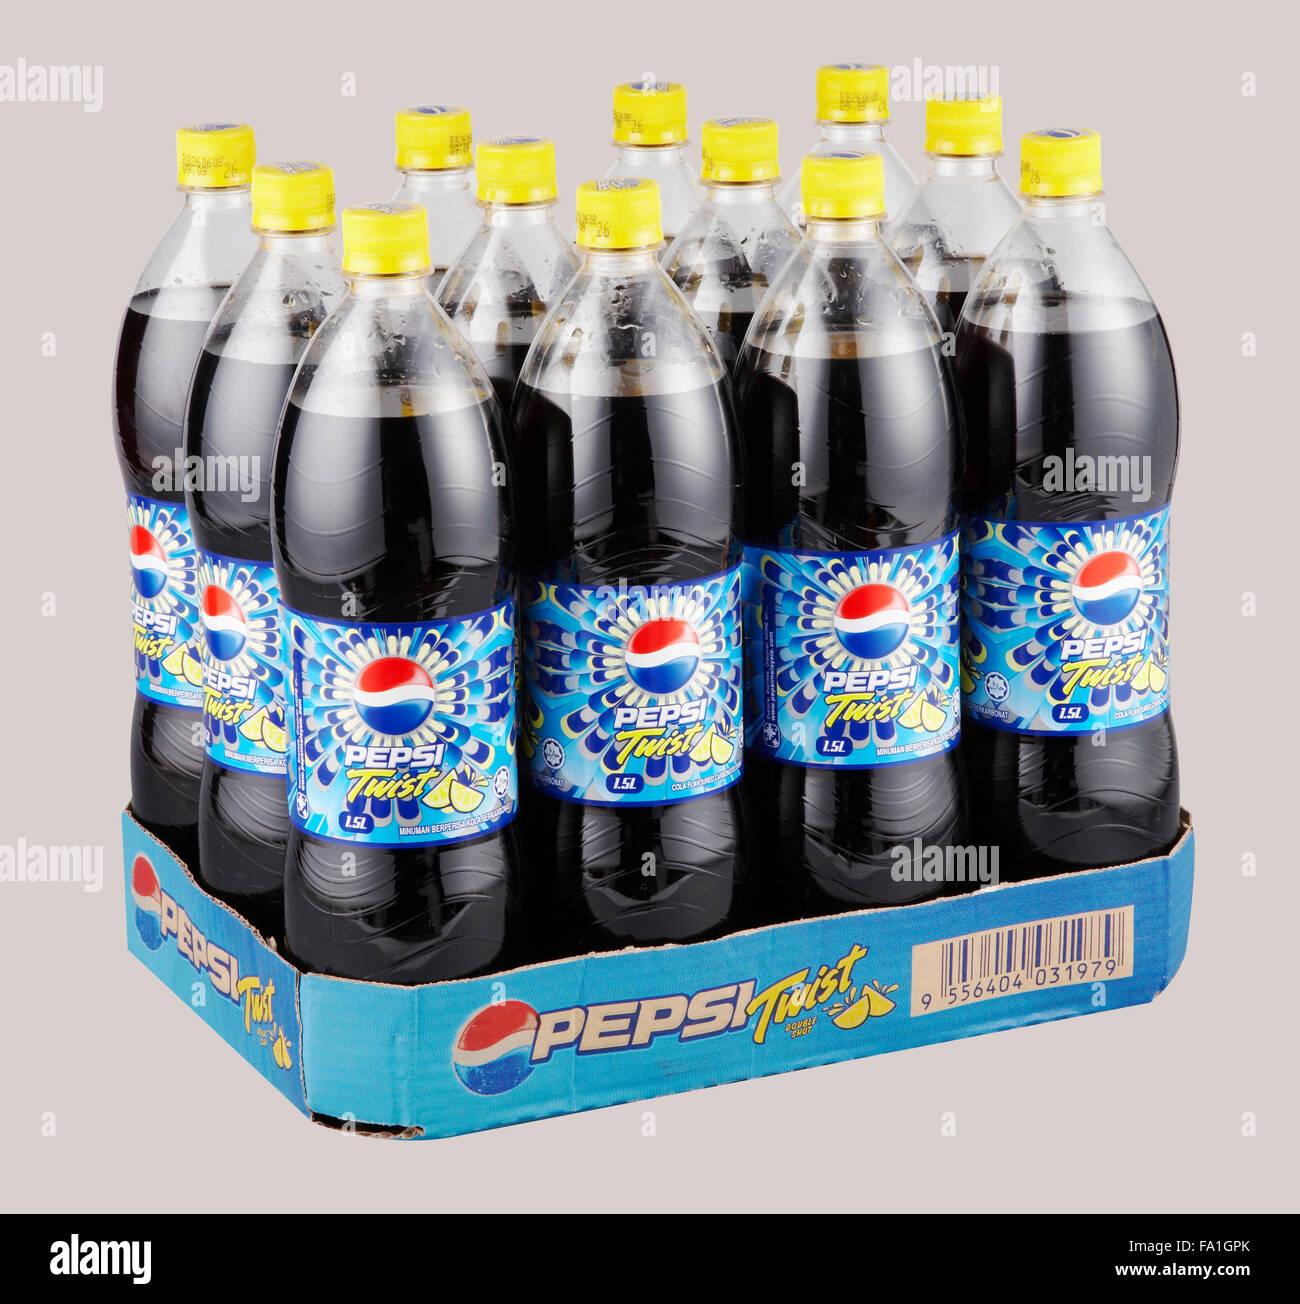 KUALA LUMPUR, MALAYSIA - March 26th 2015  bottles of Pepsi drinks